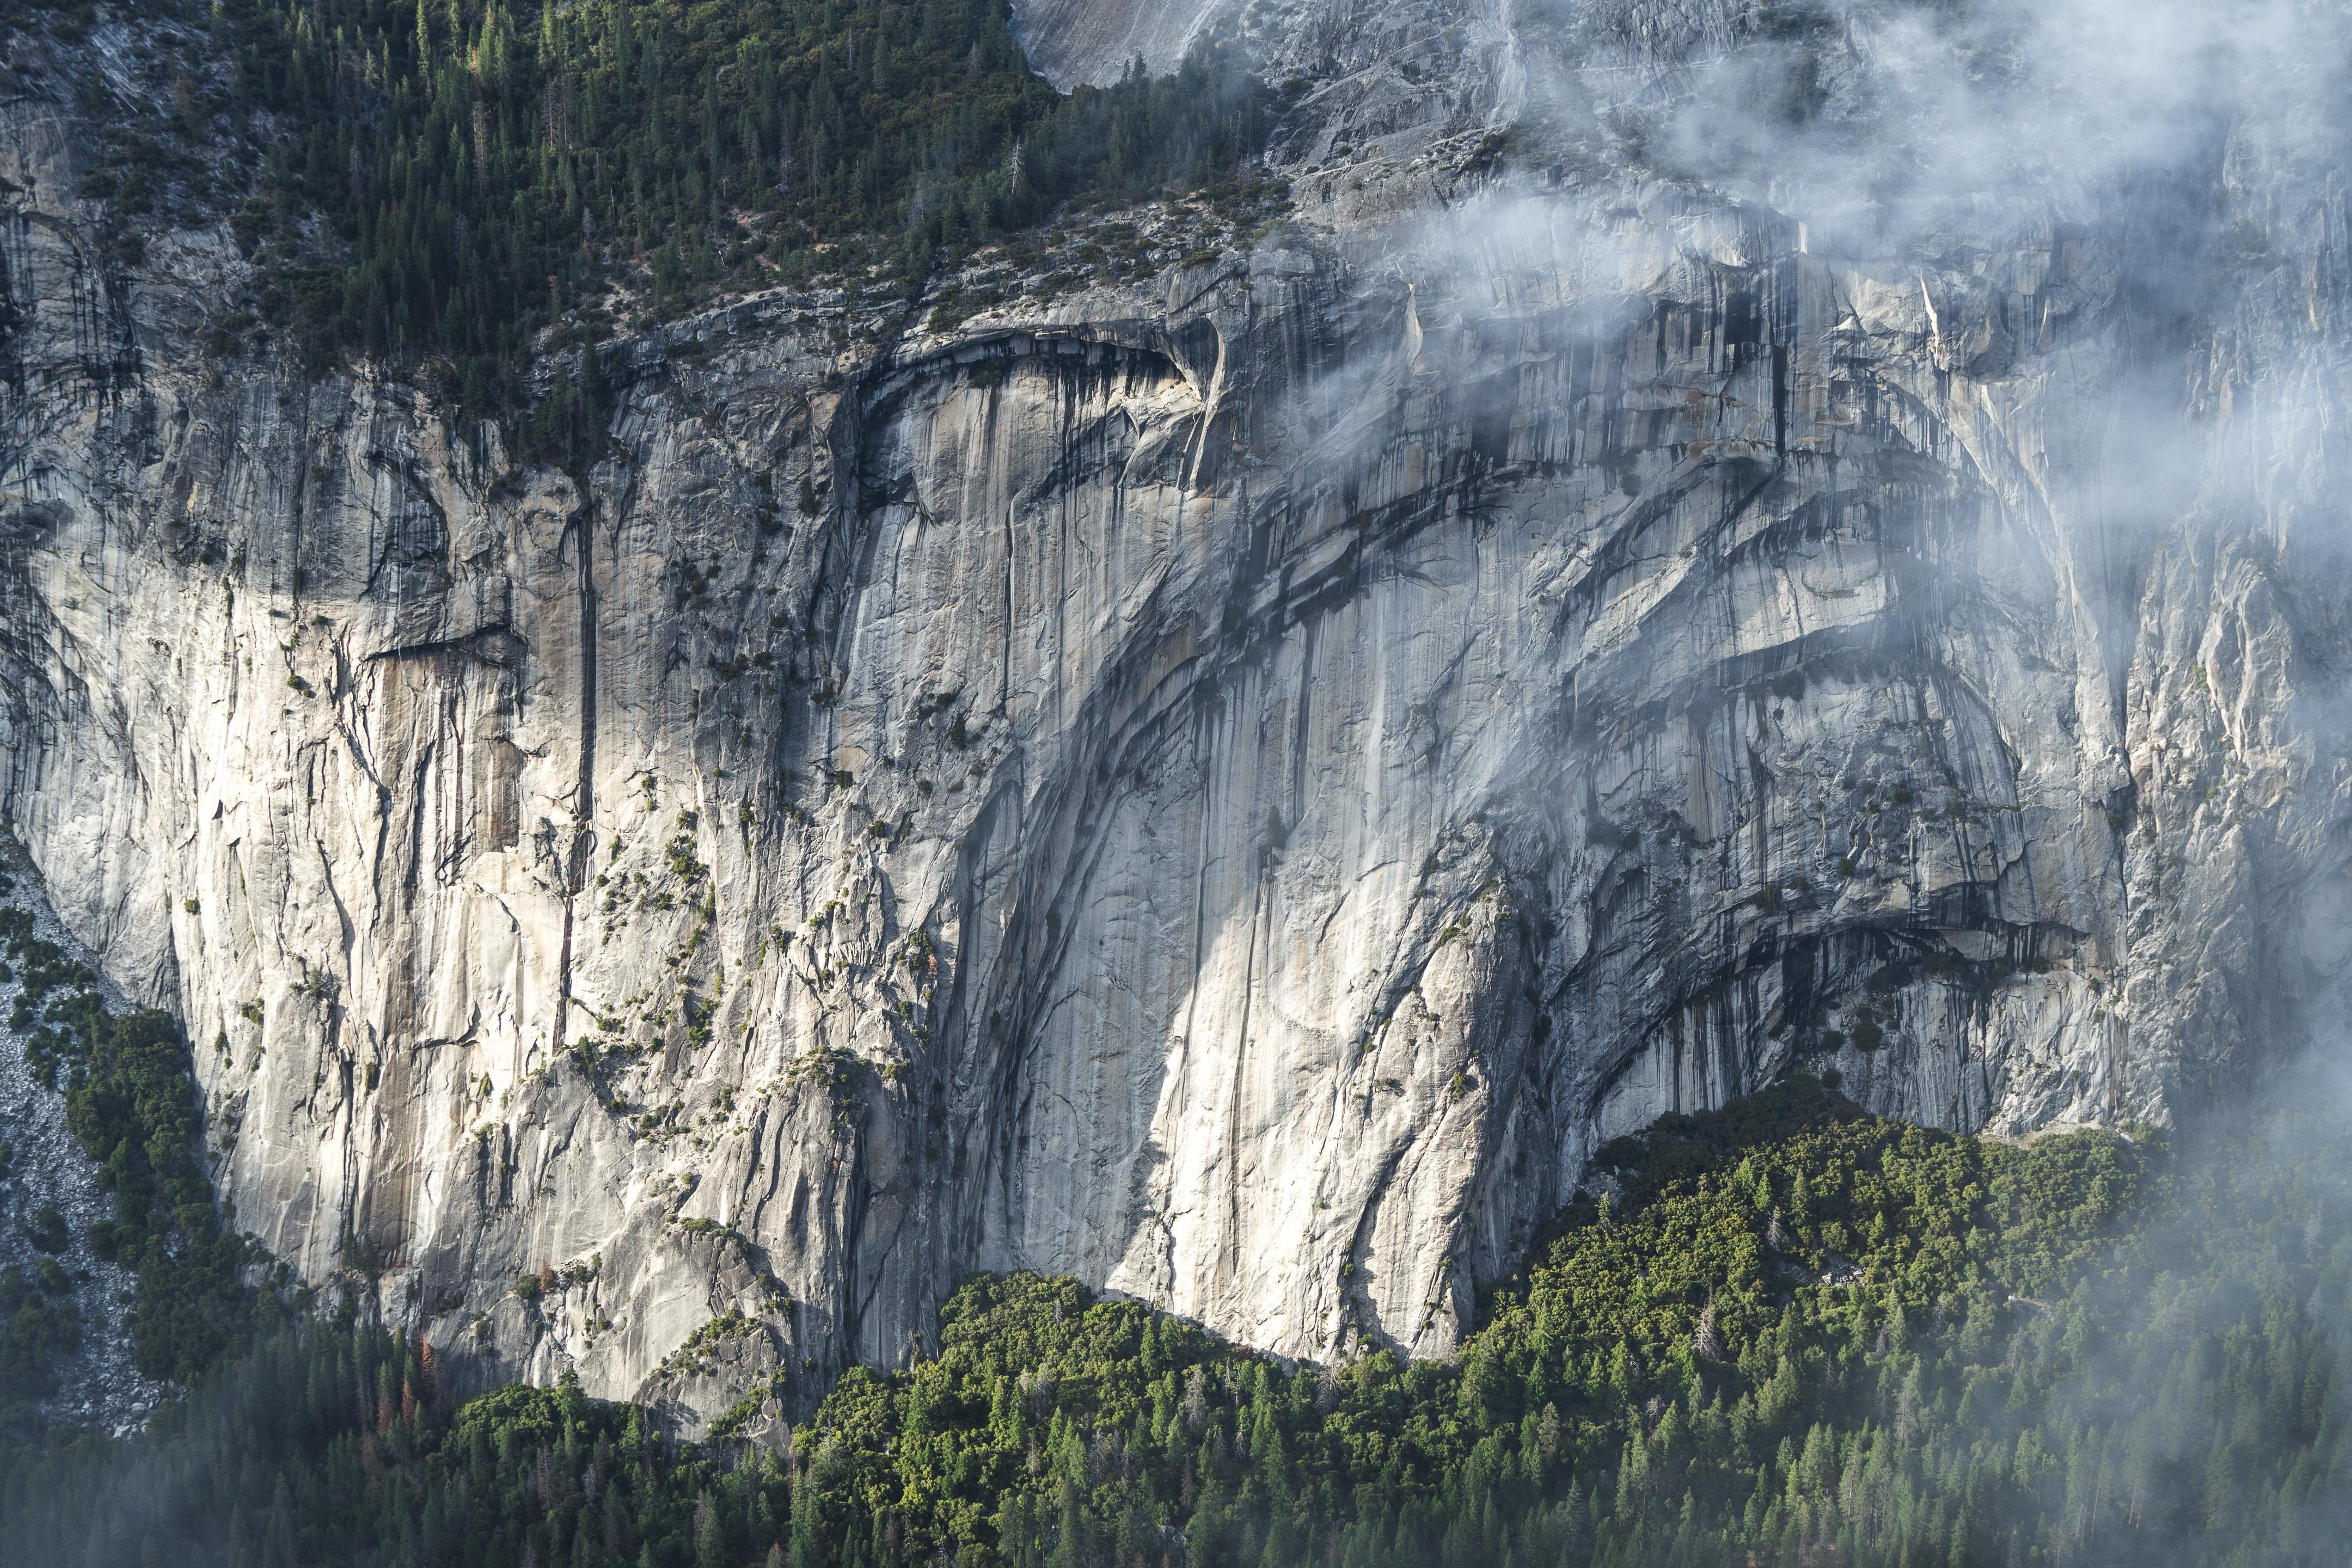 Yosemite Wallpapers 4k For Your Phone And Desktop Screen